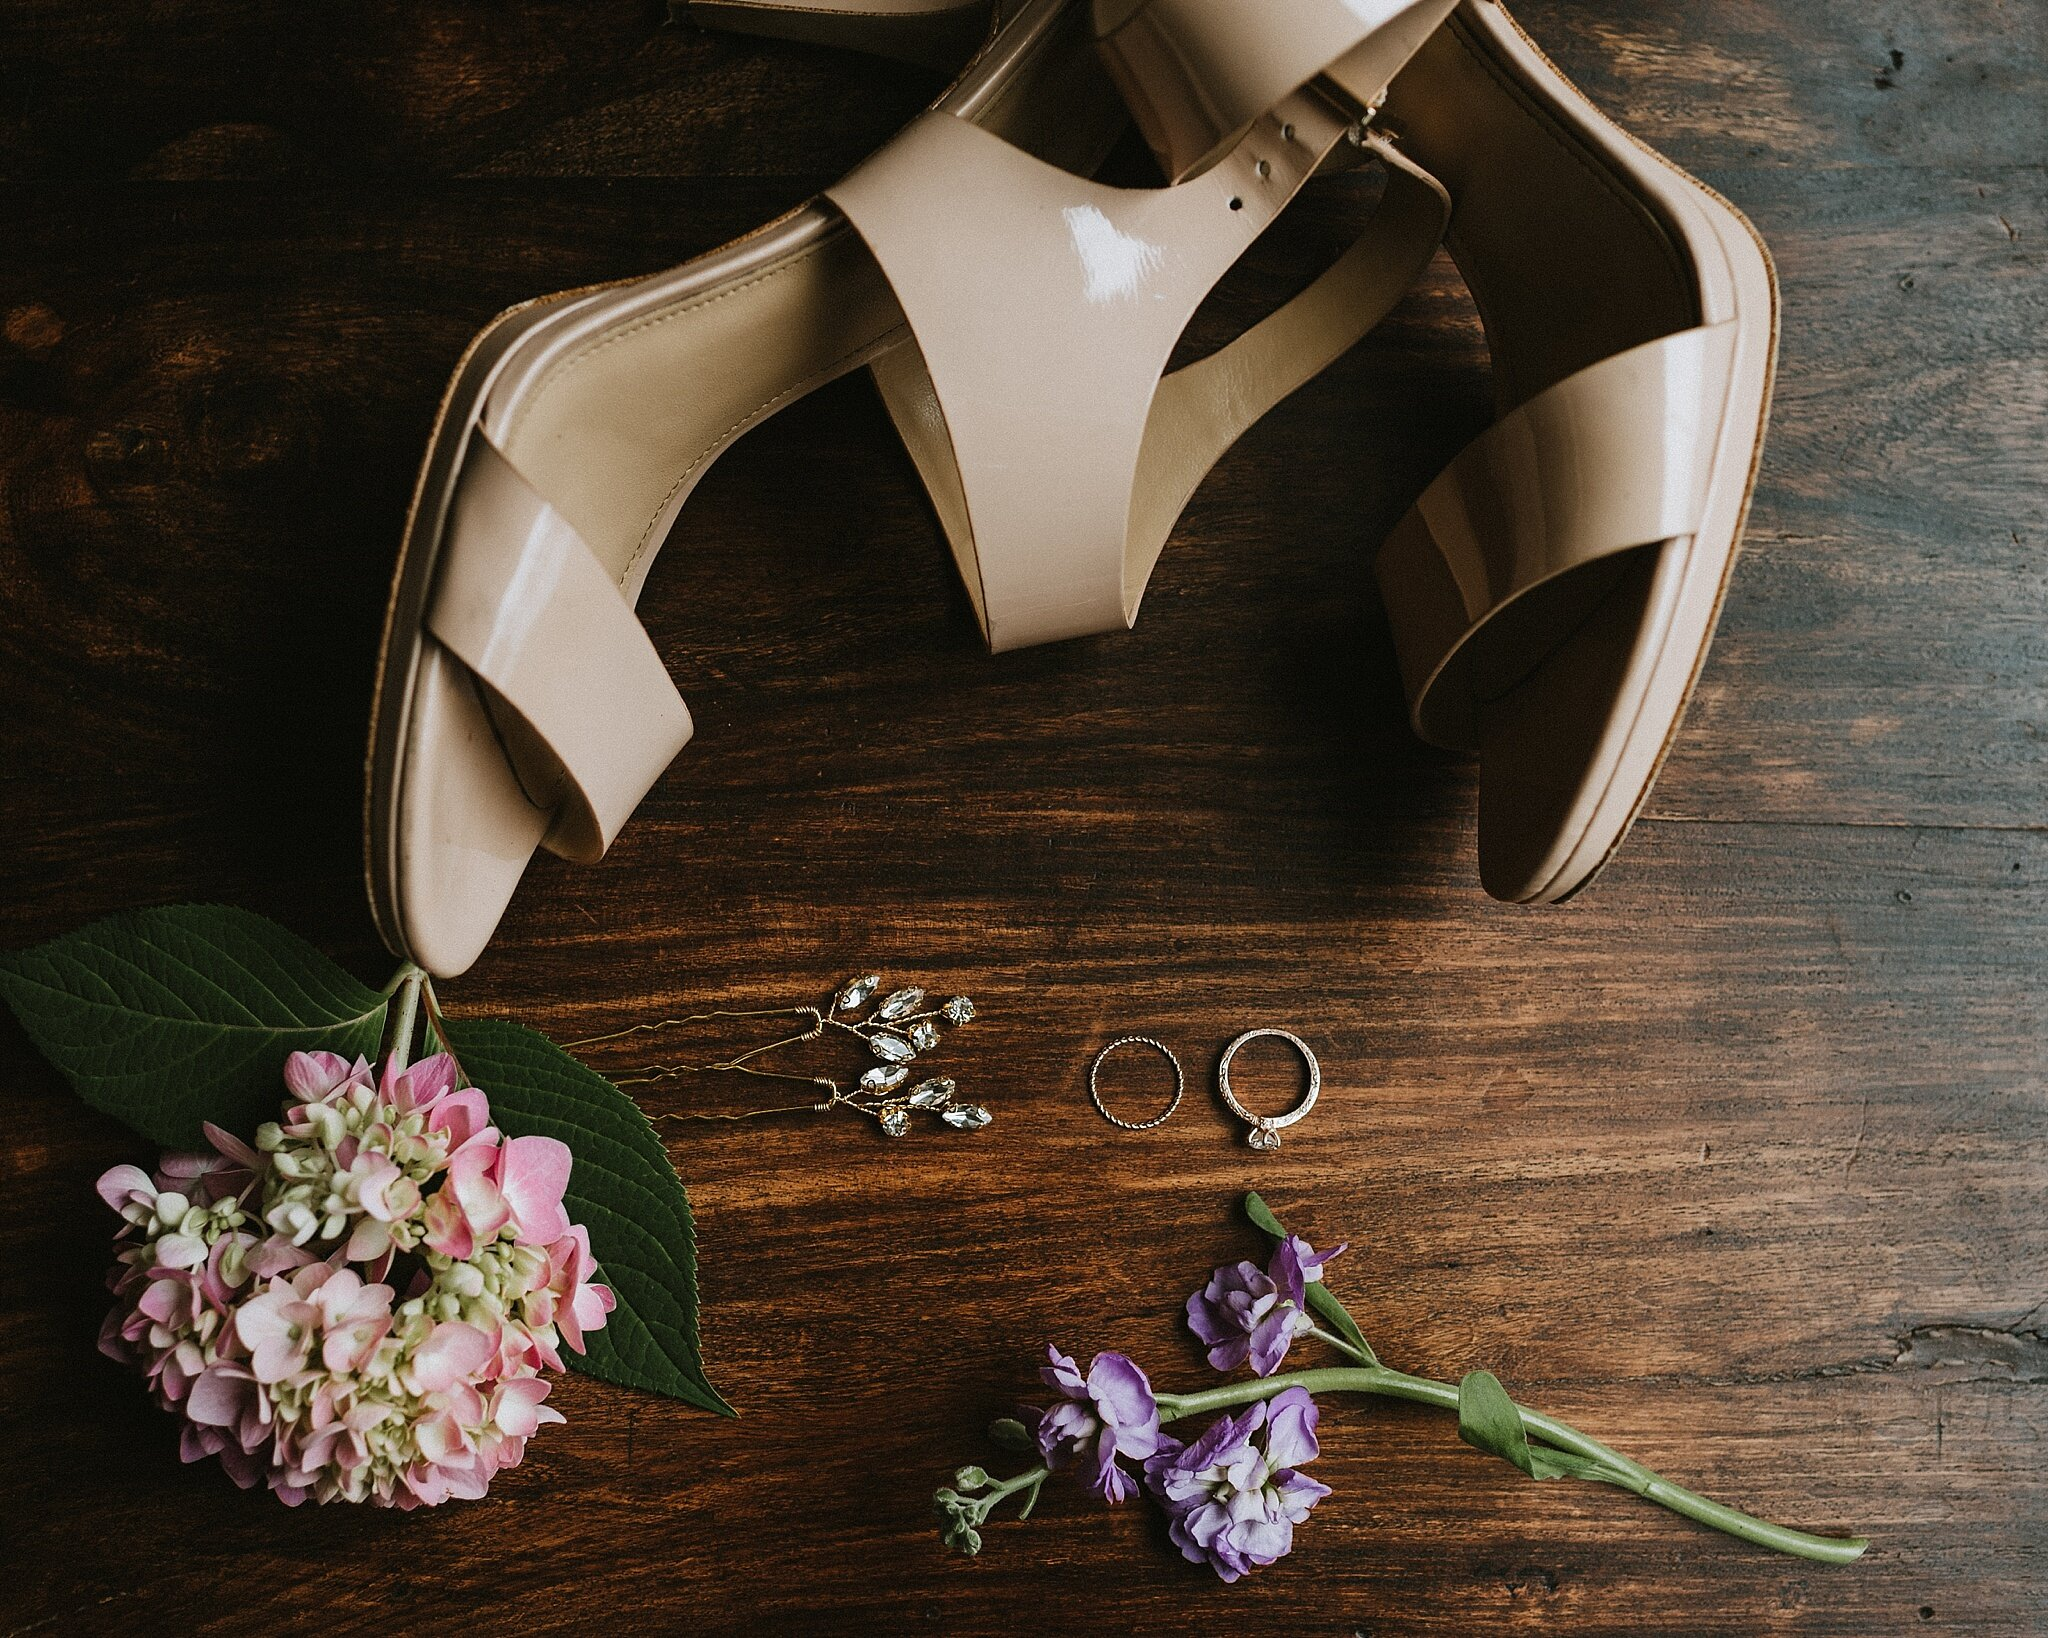 connecticut_wedding_2978.jpg